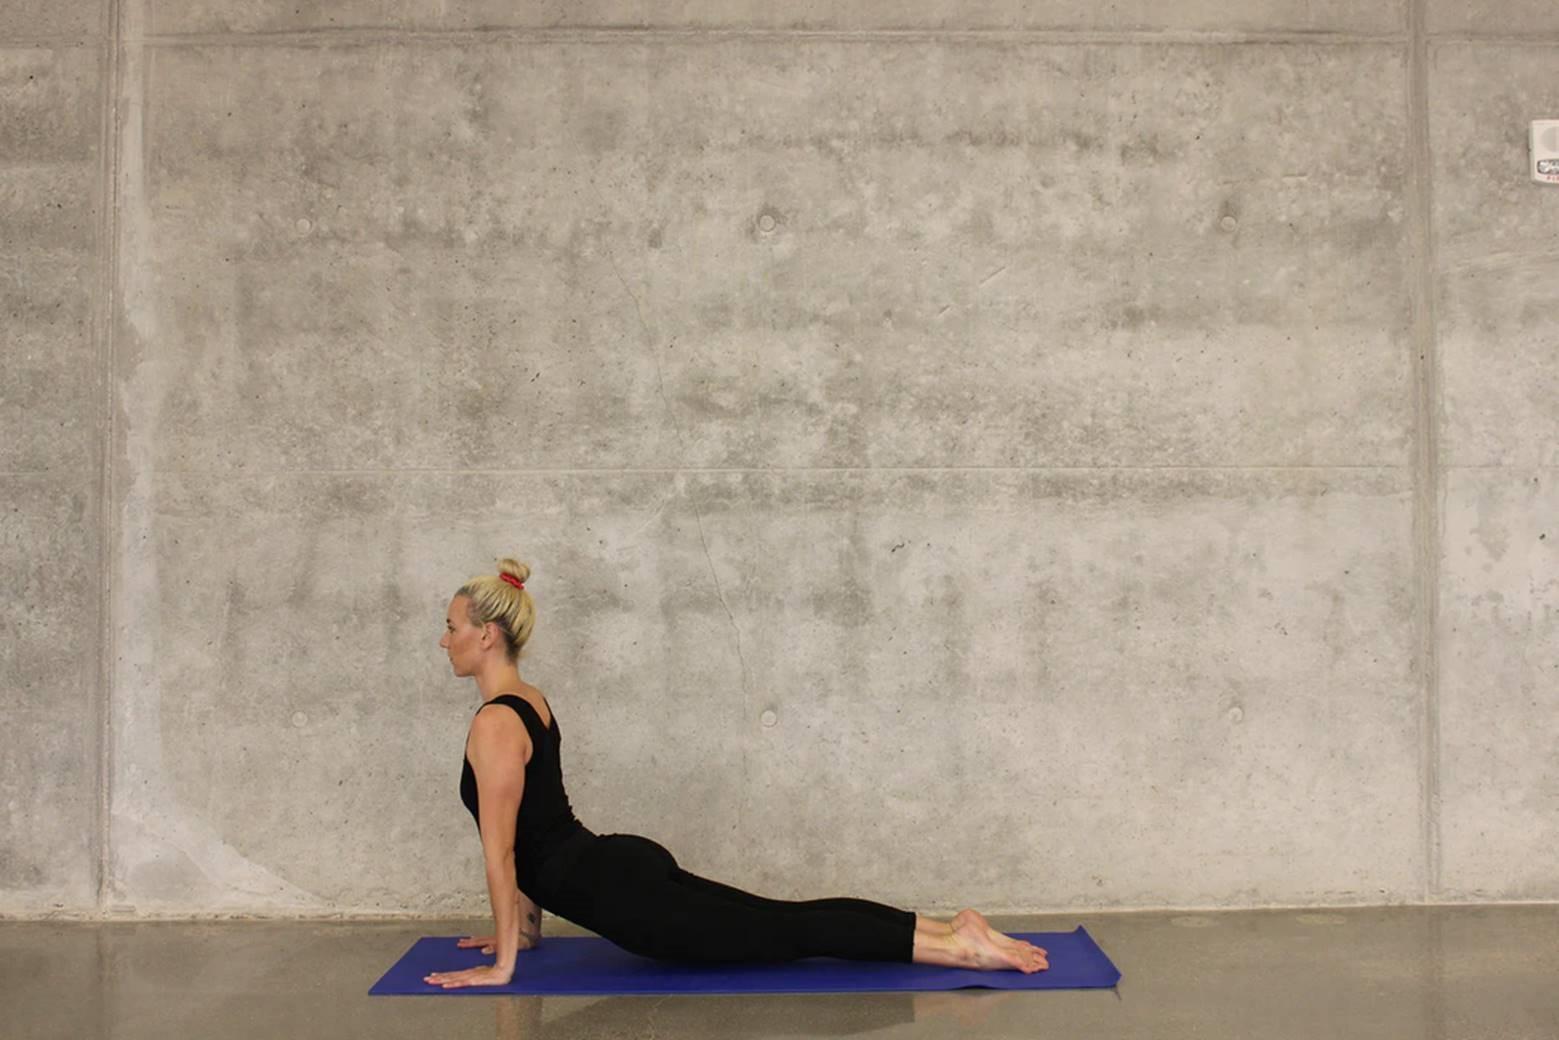 Lady doing a yoga pose